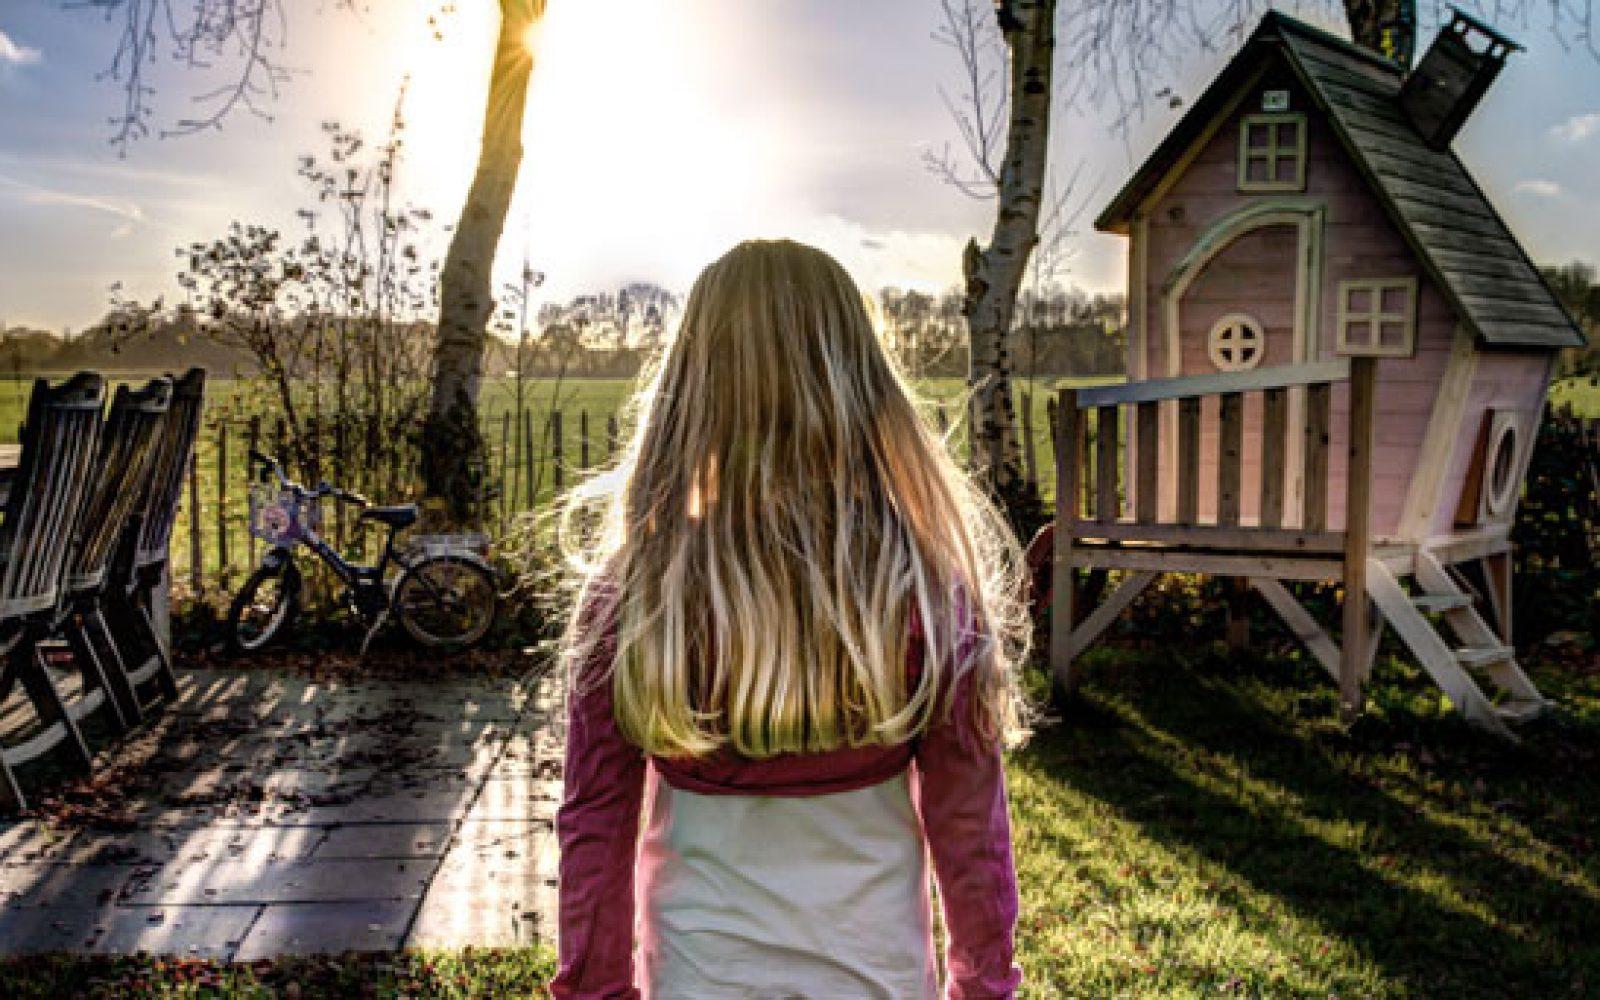 otrok - deklica v stresu